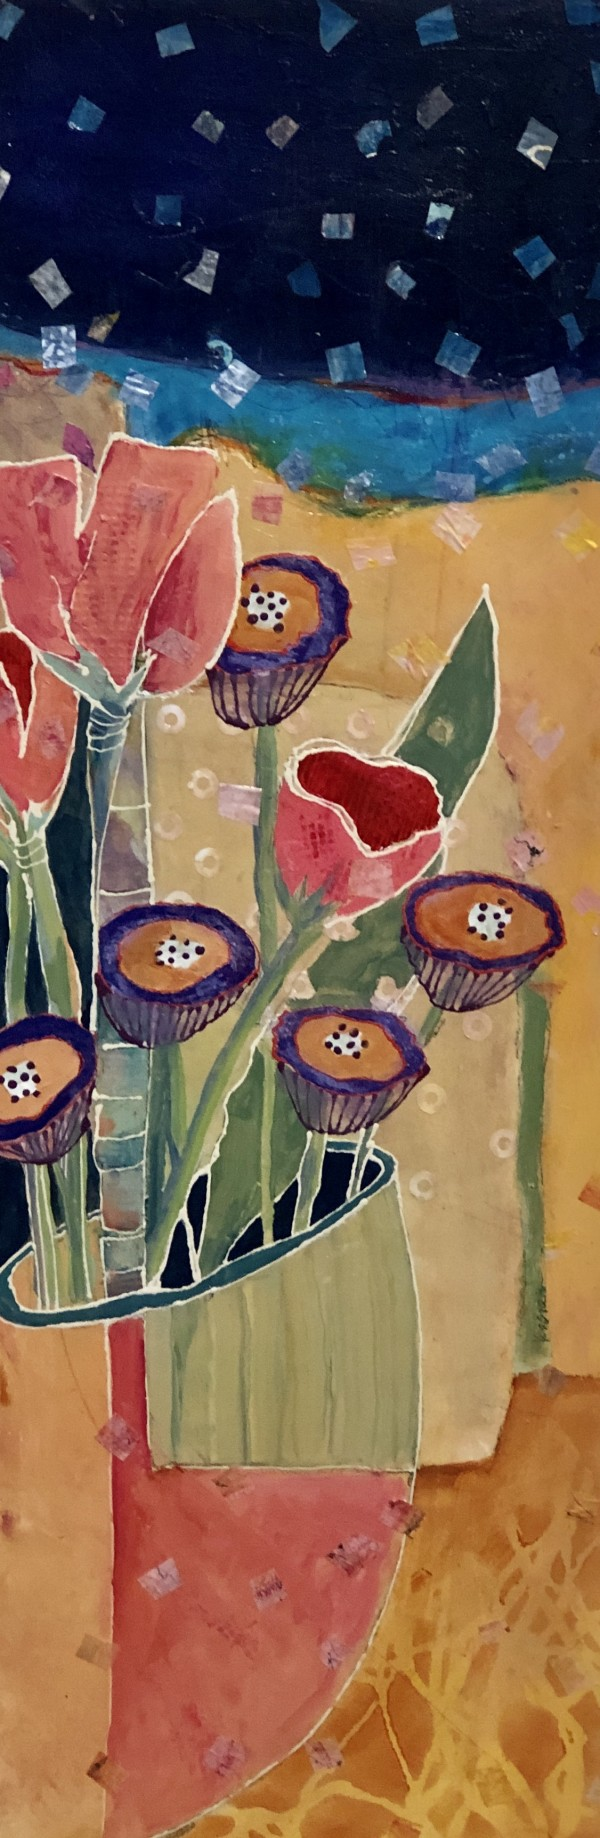 PINK TULIPS by Jill Krasner